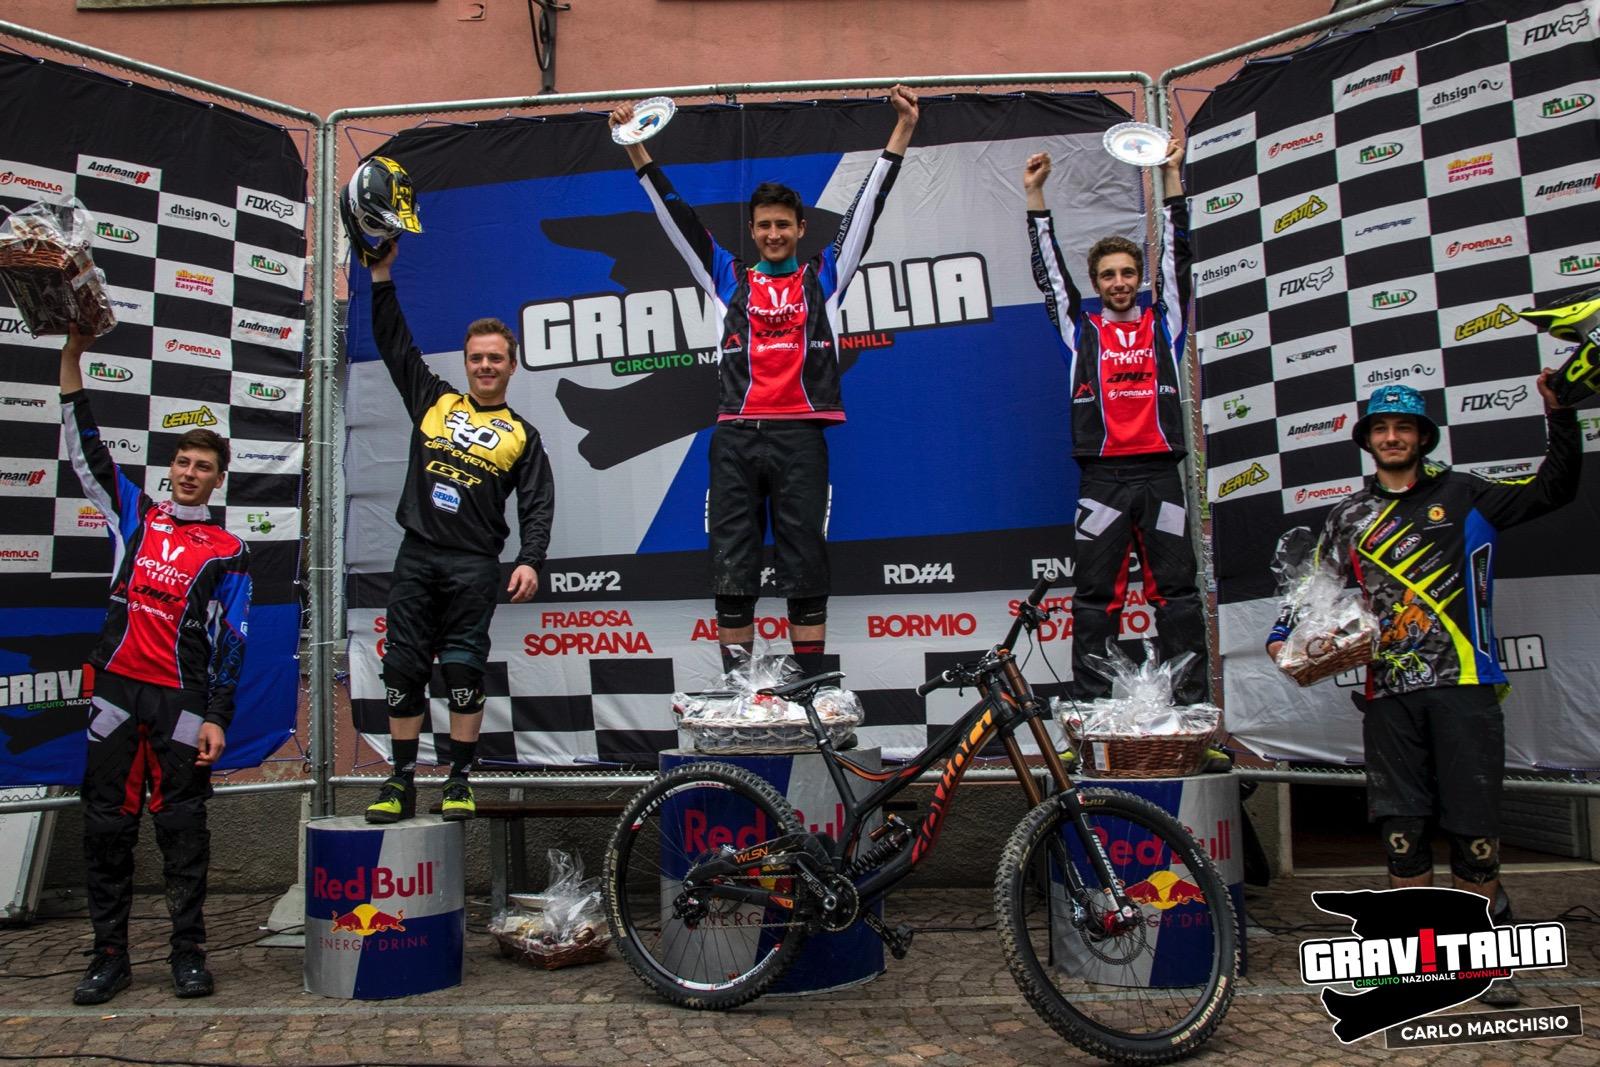 gravitalia_2015_frabosa_soprana_podio_uomini